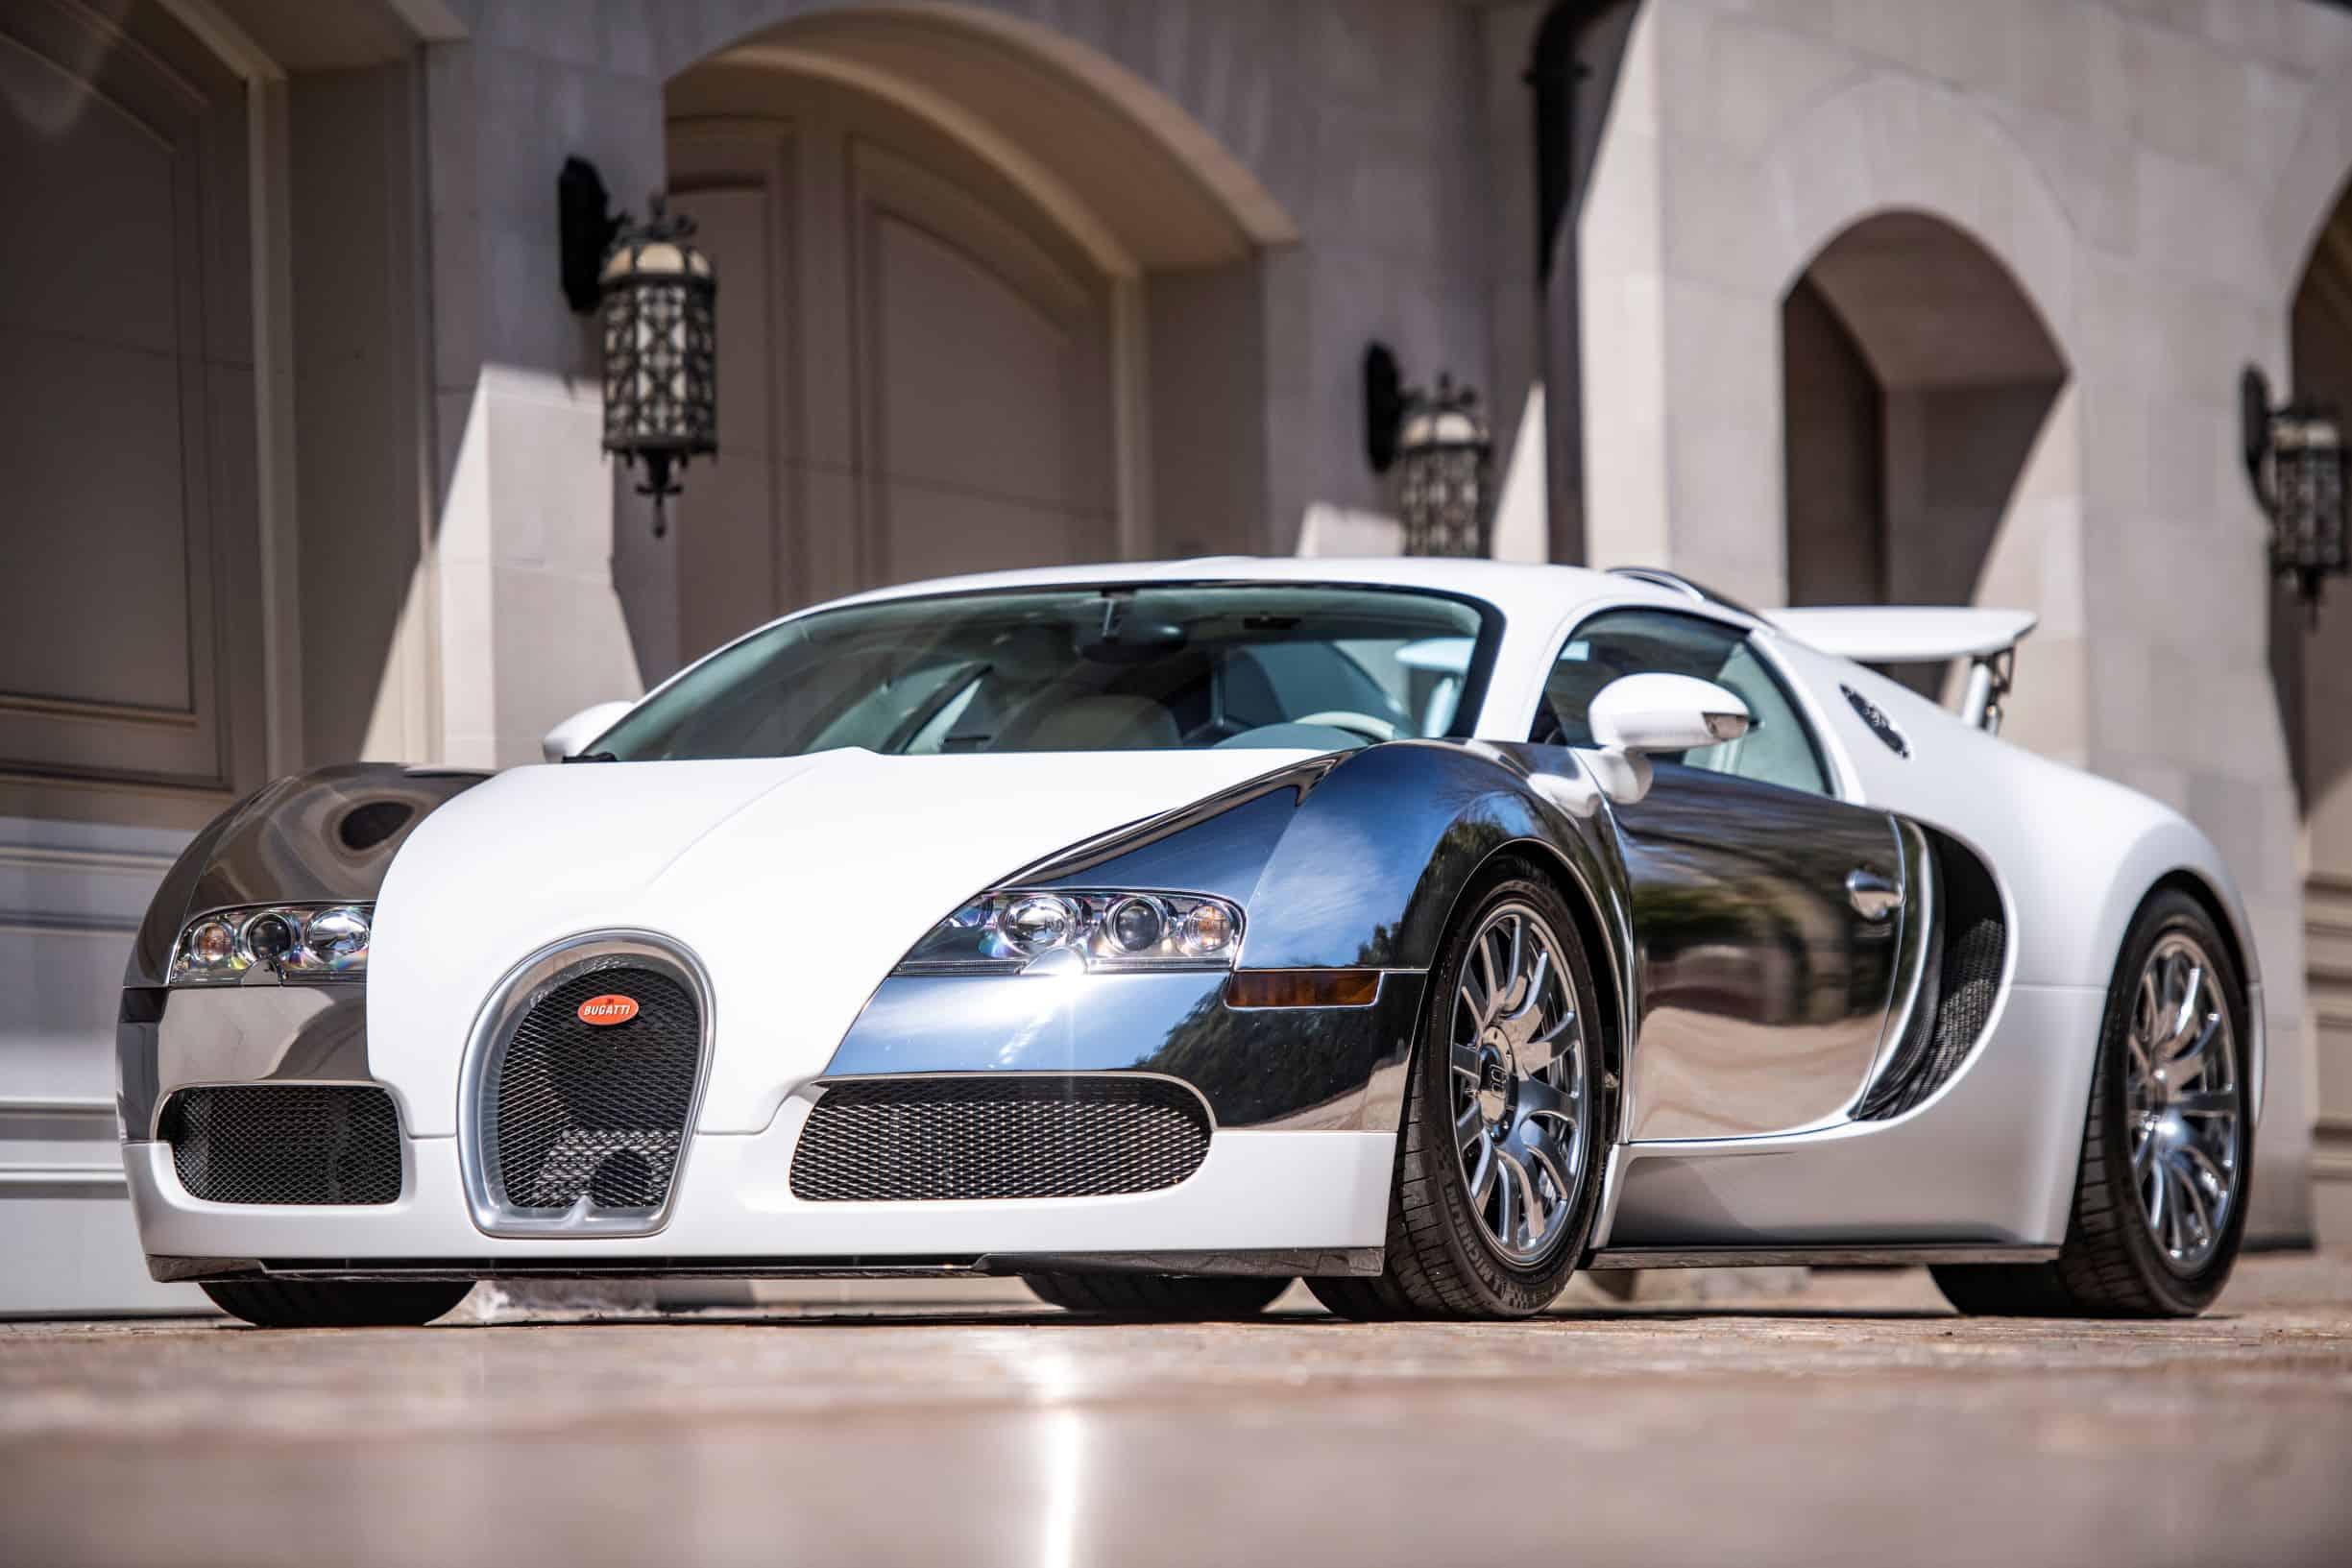 Bugatti Veyron previously owned by Flloyd Mayweather